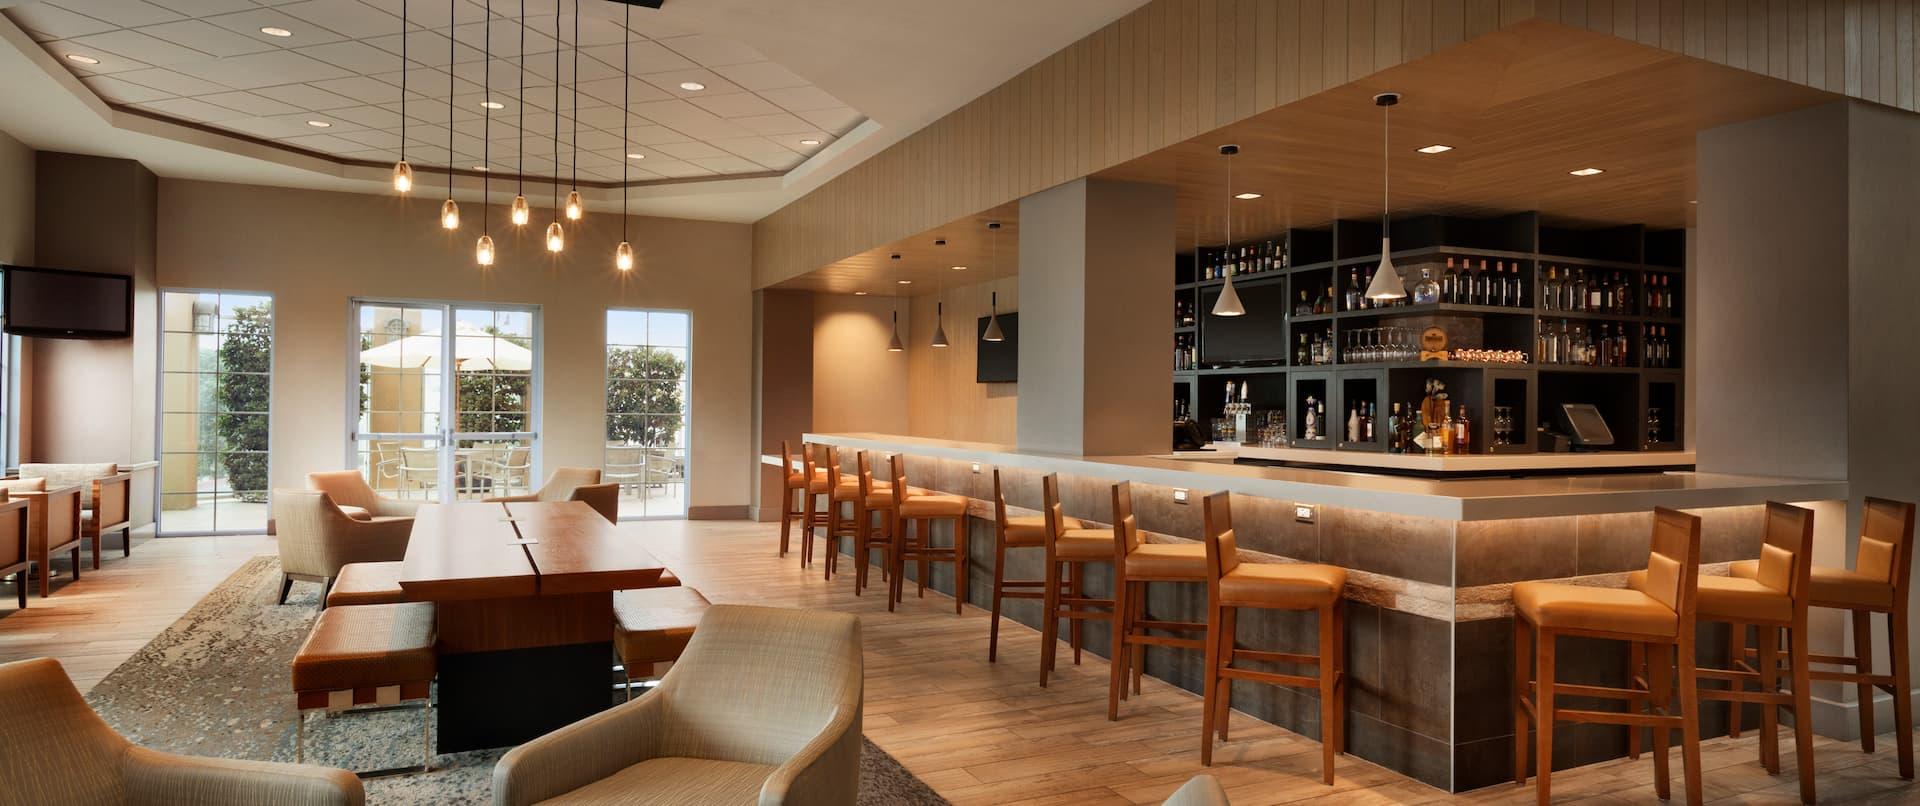 Lounge Area and Bar